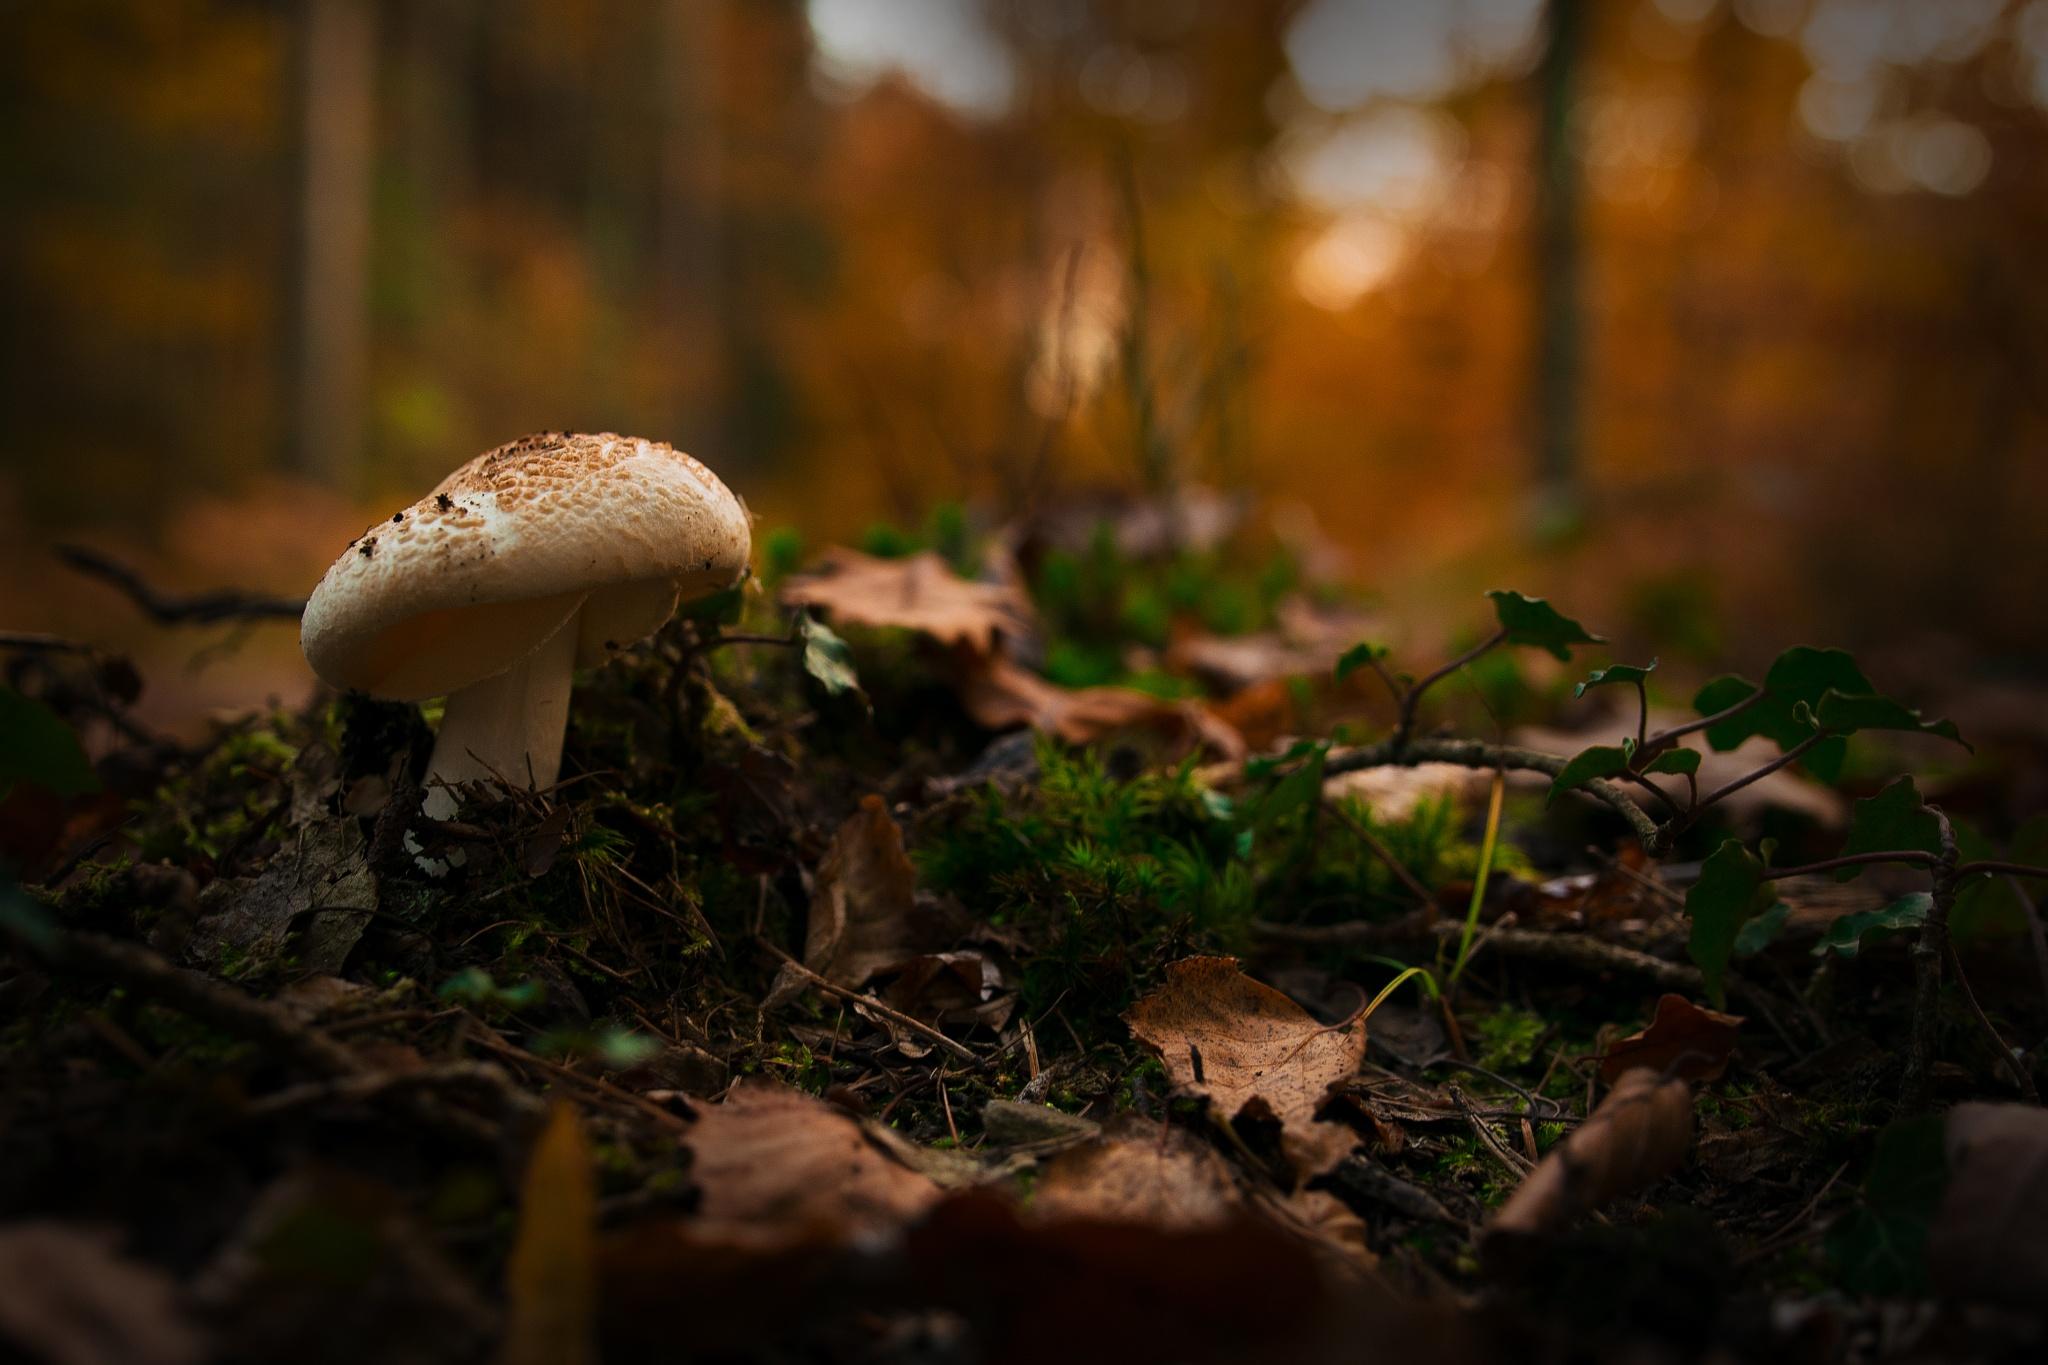 Amongst leaves by Snufkin